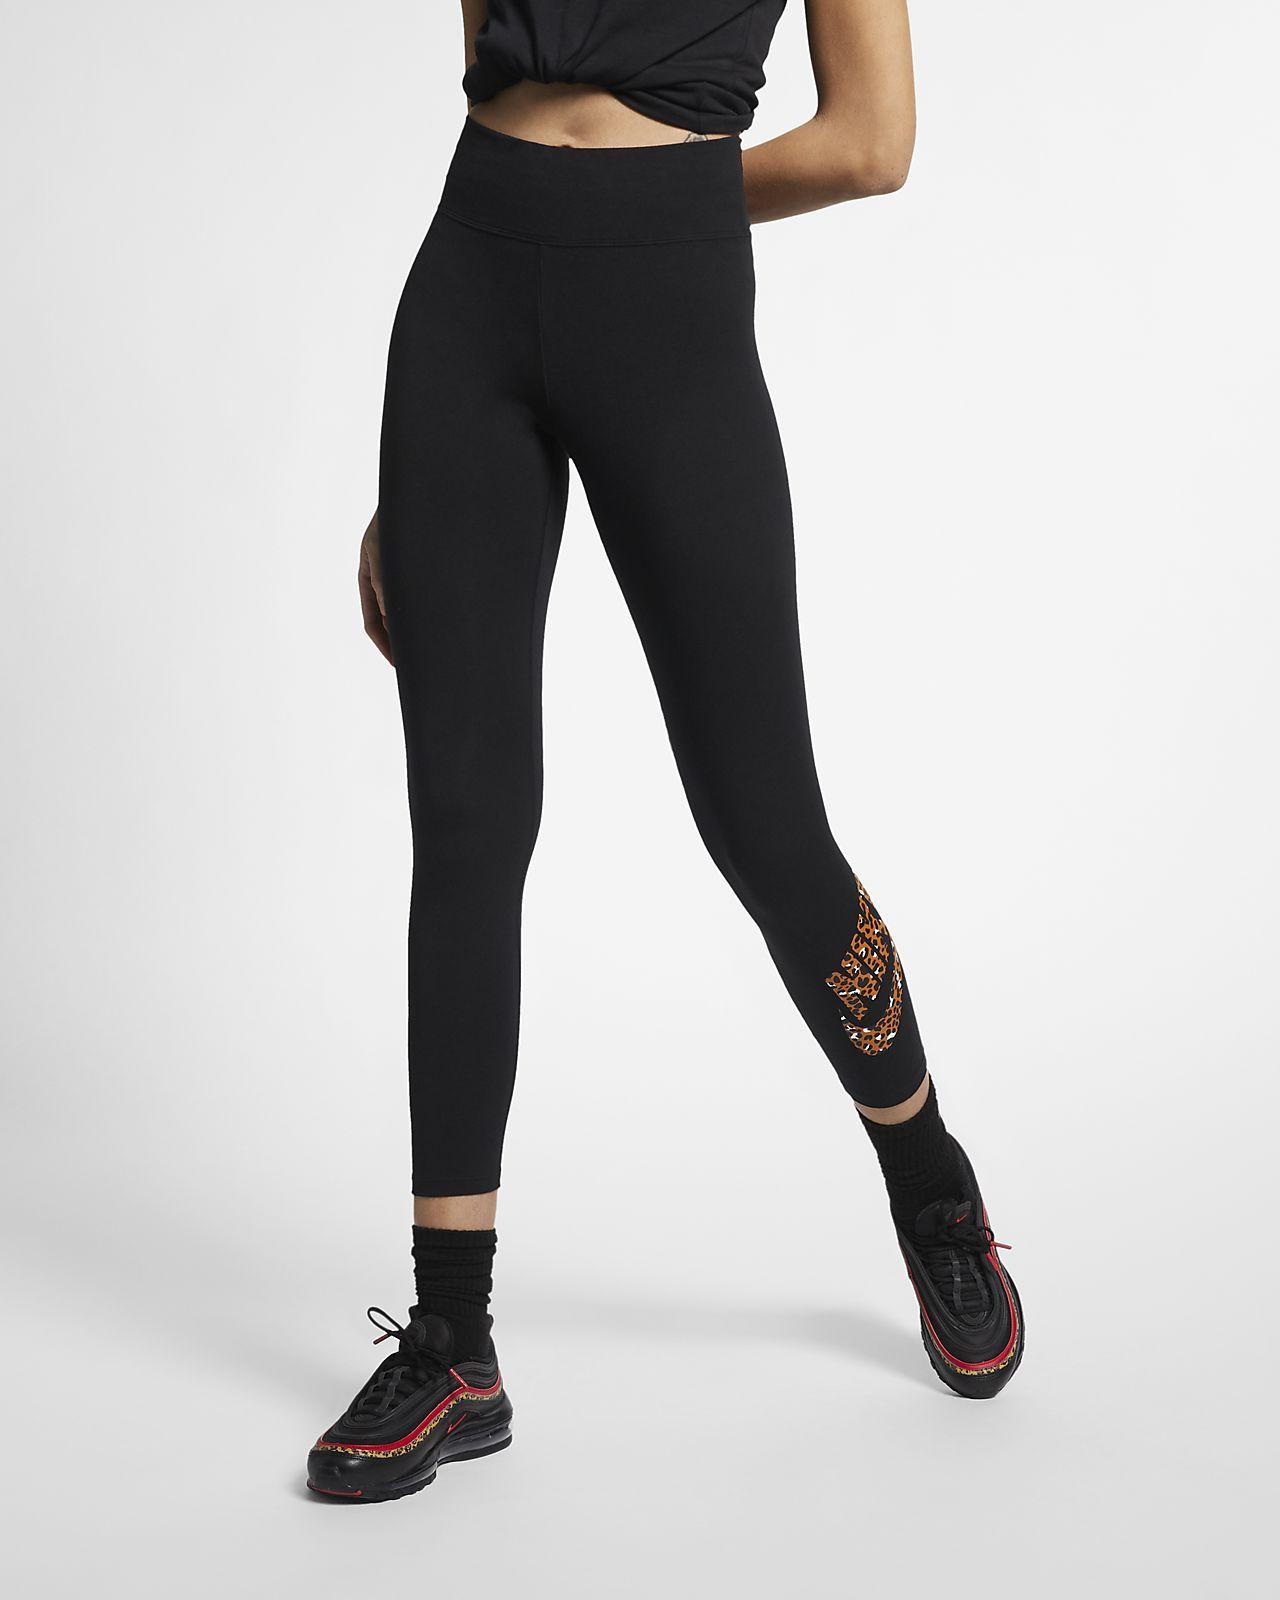 Leggings Nike Sportswear Animal Print - Donna